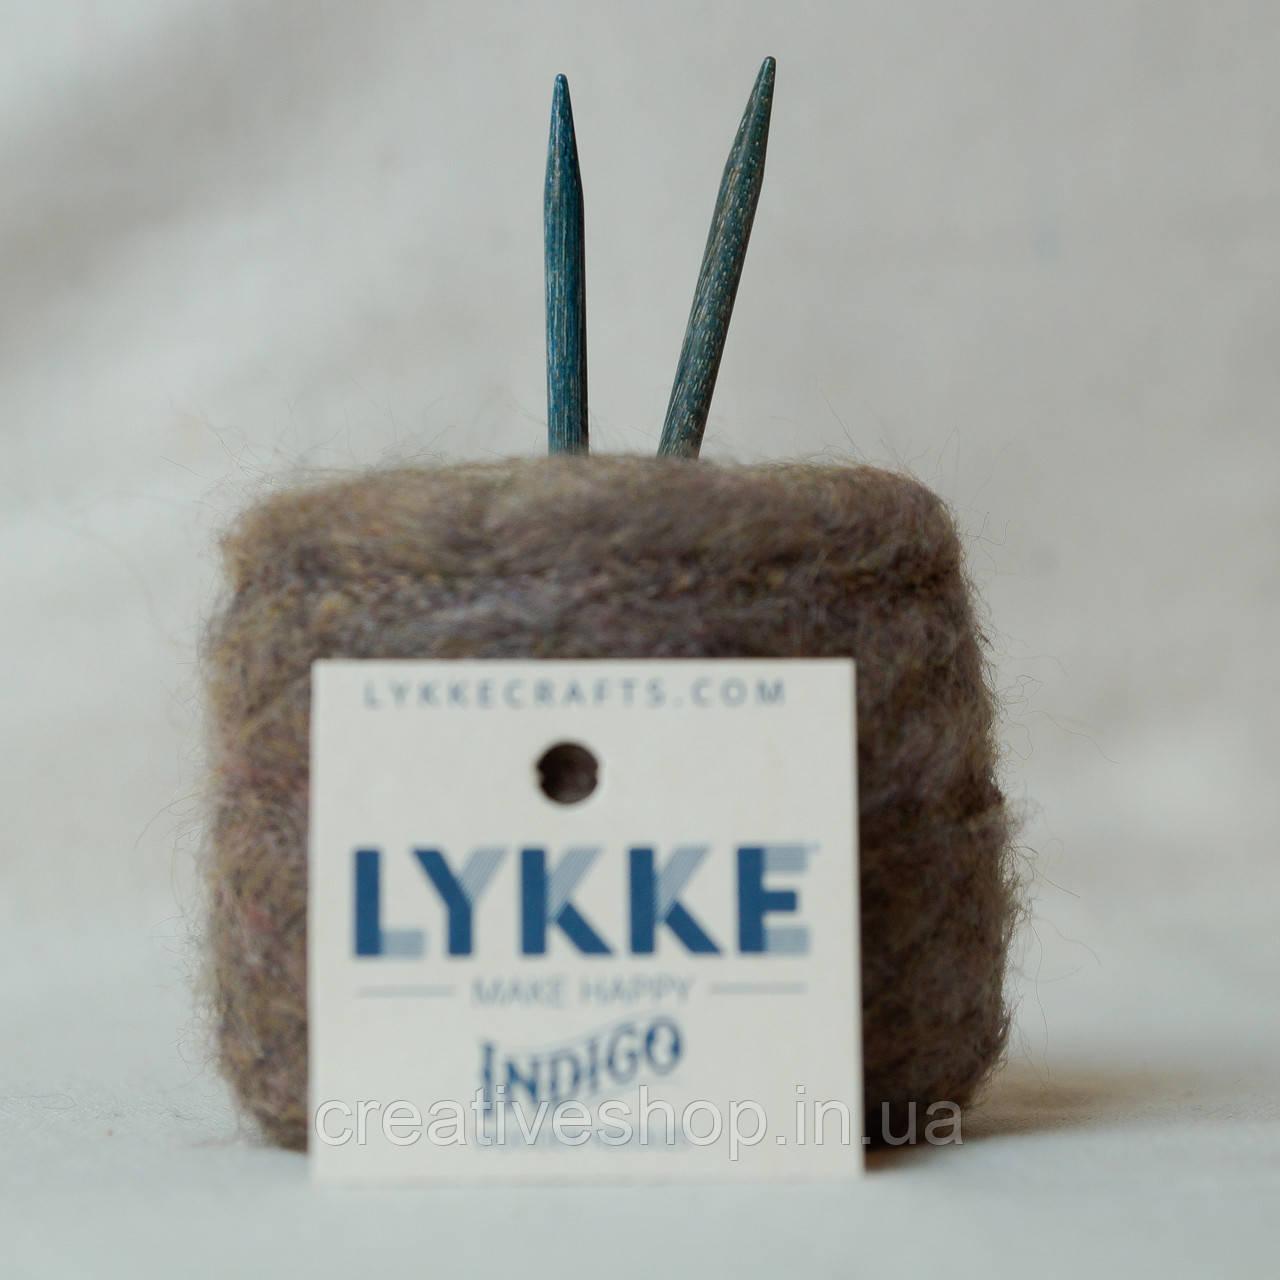 Съемные  стандартные спицы Lykke Indigo 7